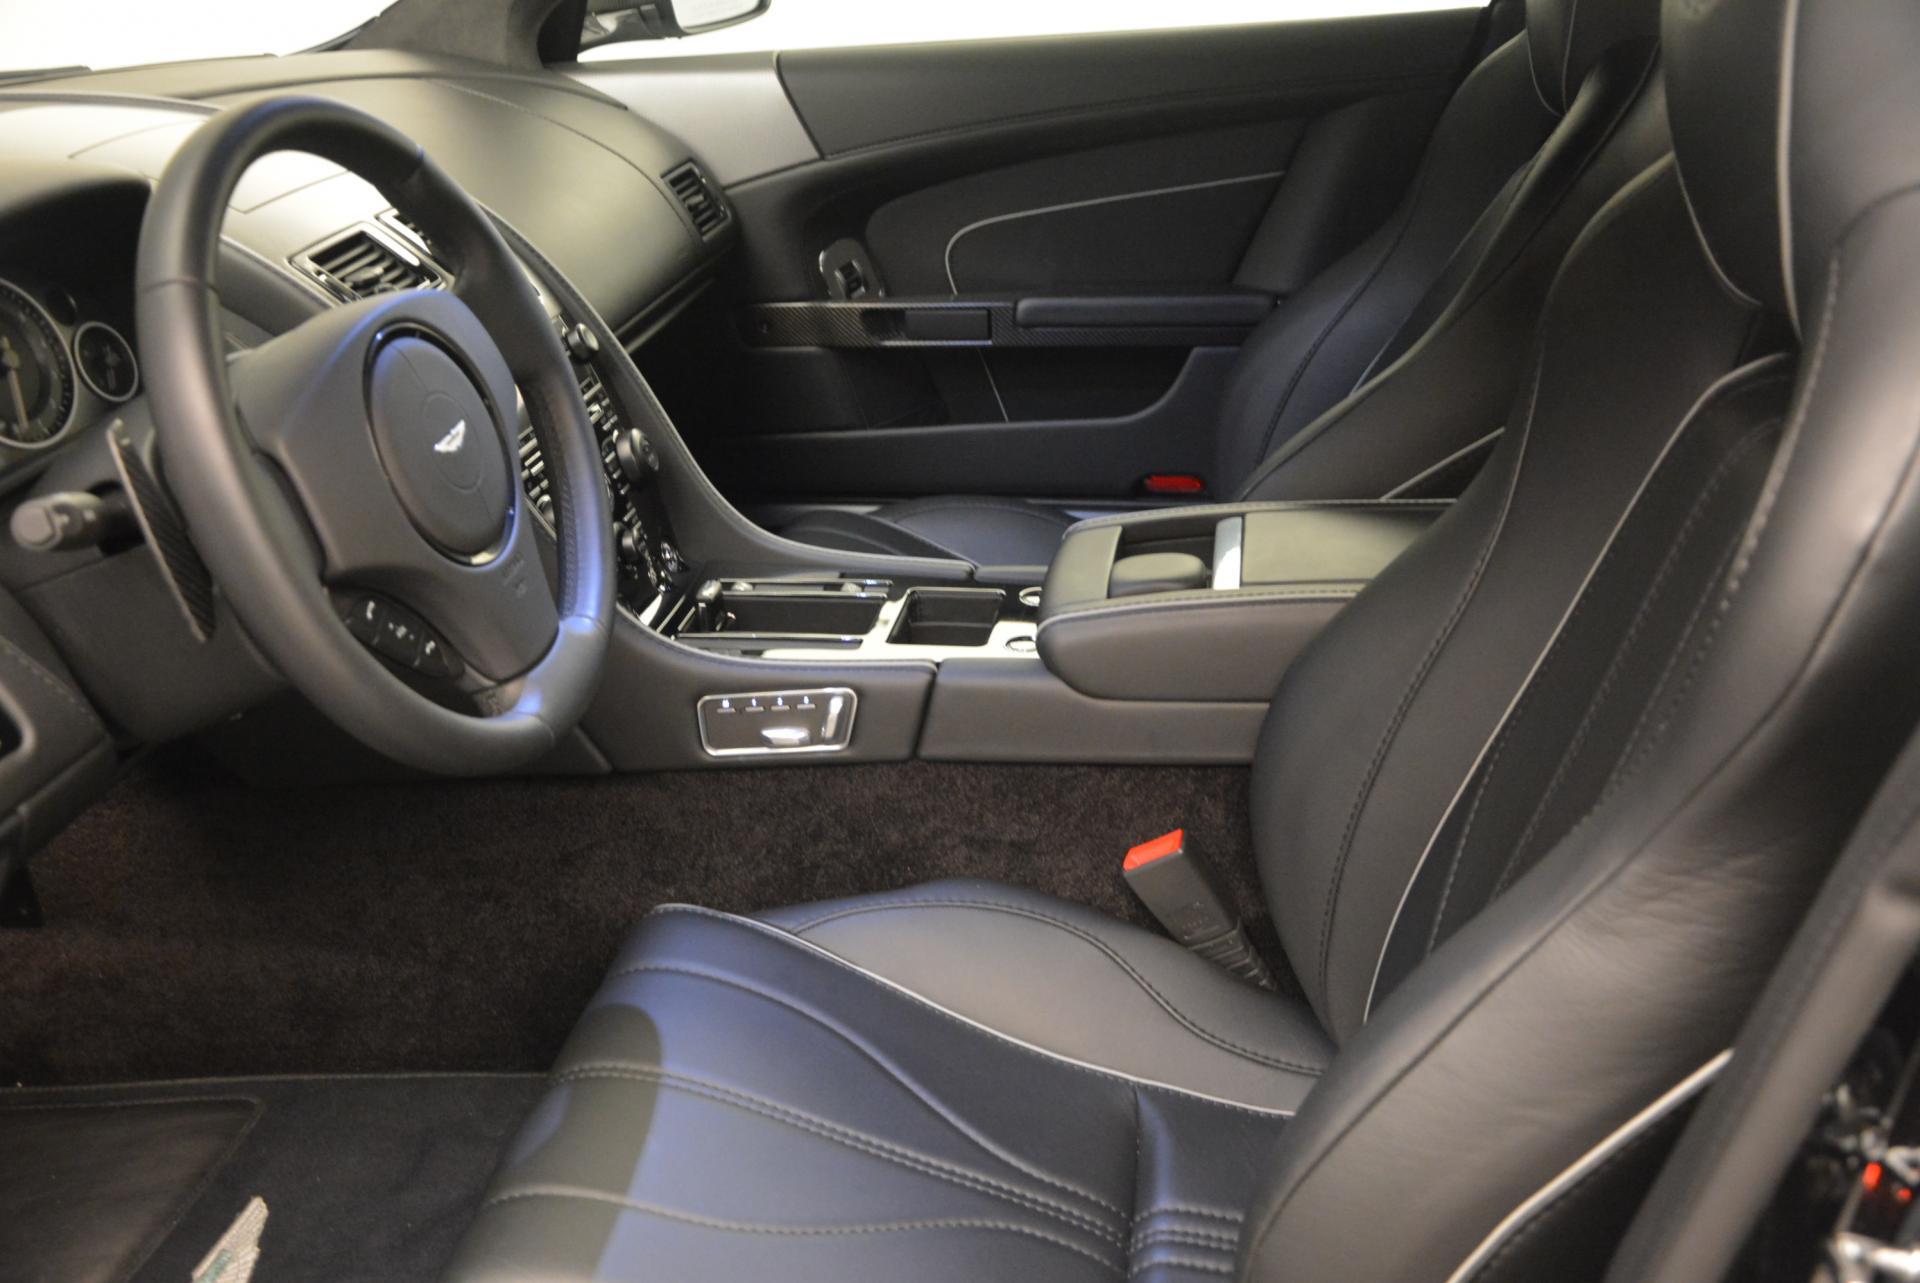 Used 2015 Aston Martin DB9 Carbon Edition For Sale In Greenwich, CT. Alfa Romeo of Greenwich, 7349 528_p14